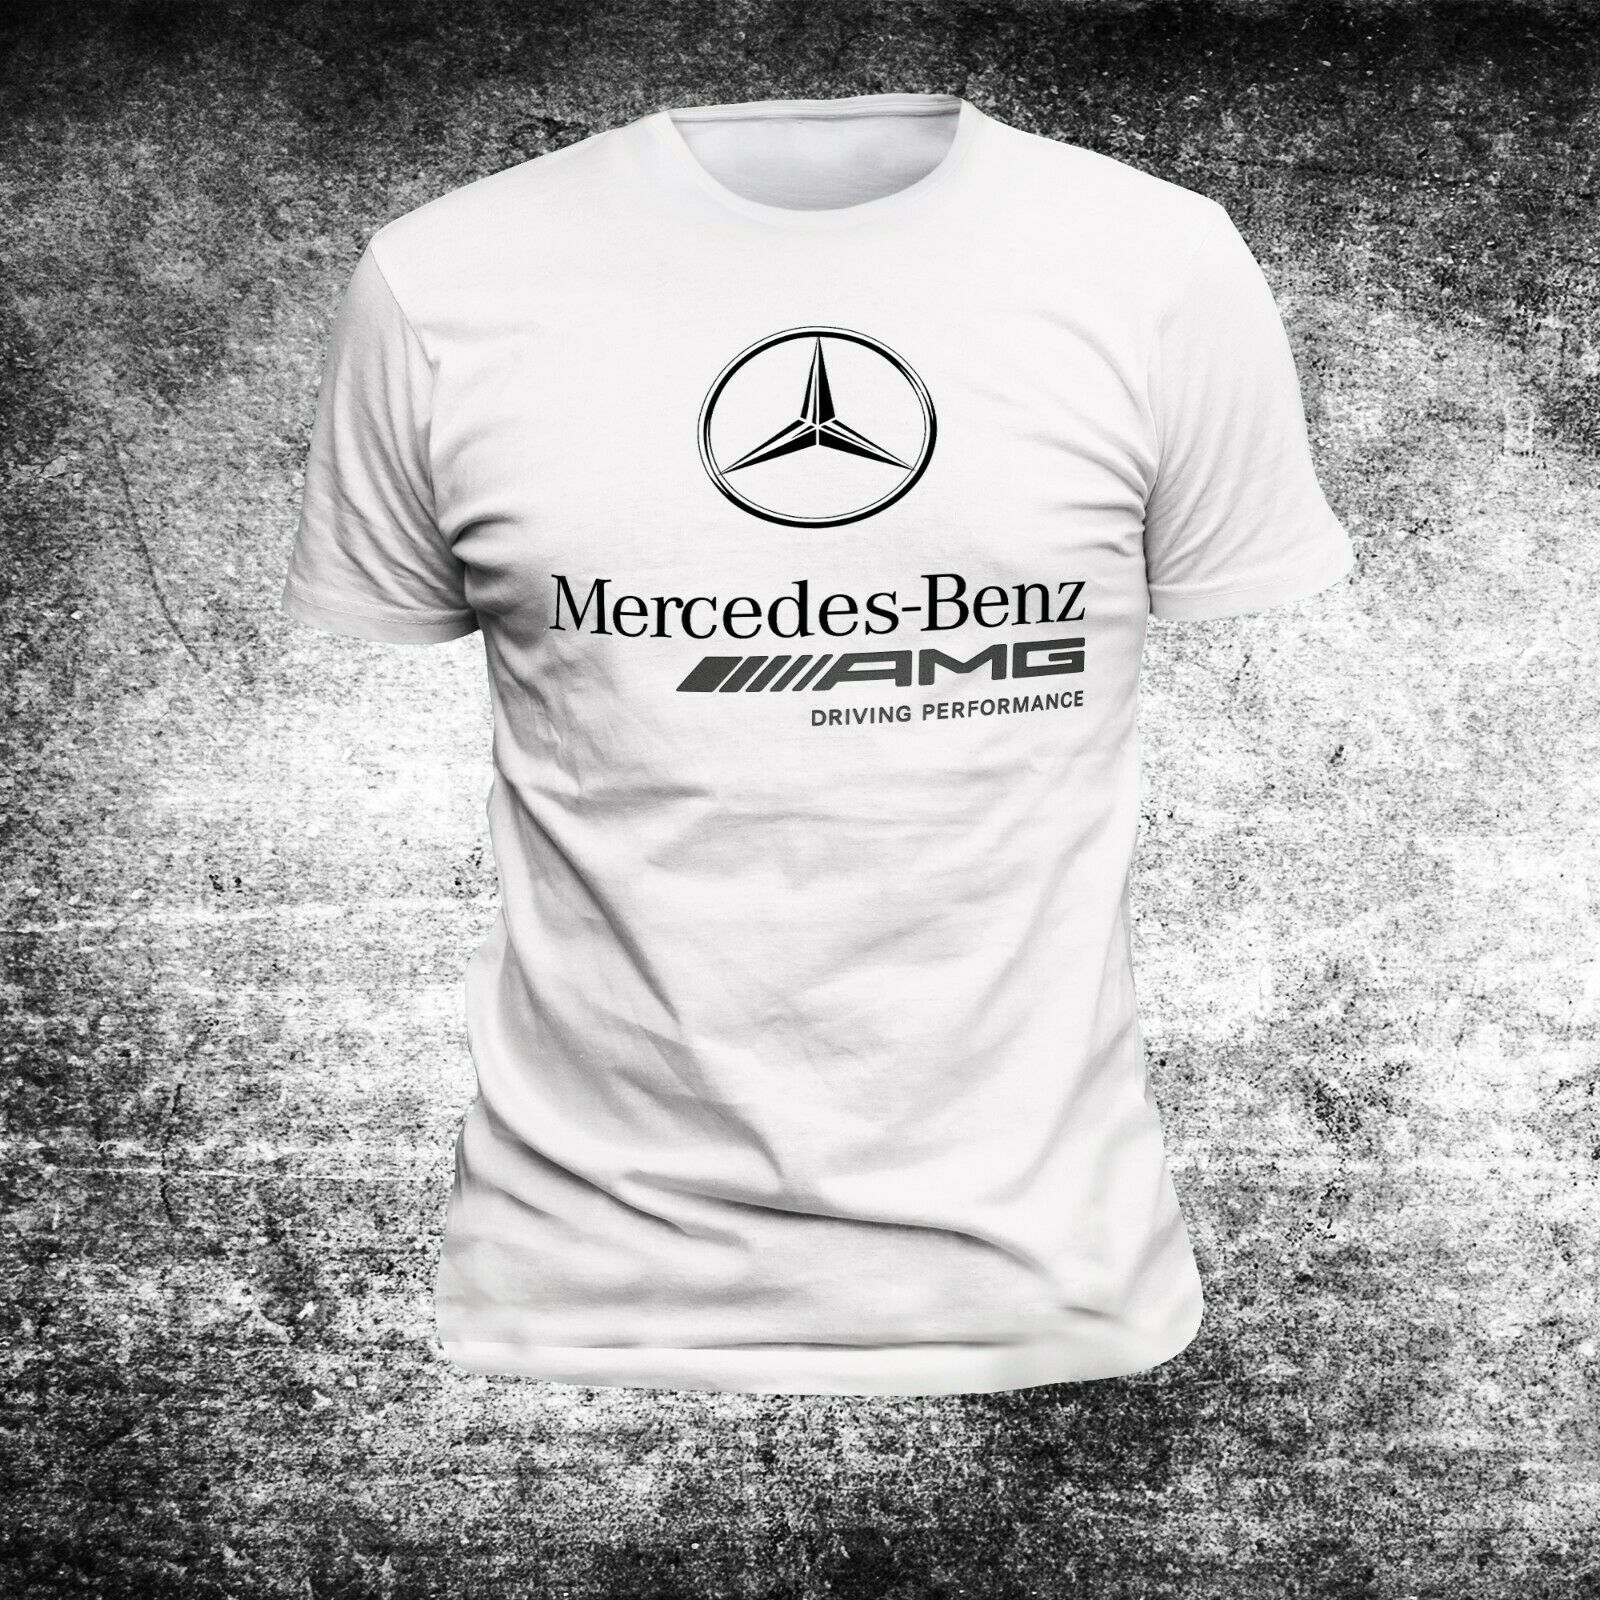 T-Shirt Mercedes Gla Cla Gle Cls Gls Car Auto Fan Tuning Neu XS/5X 13.